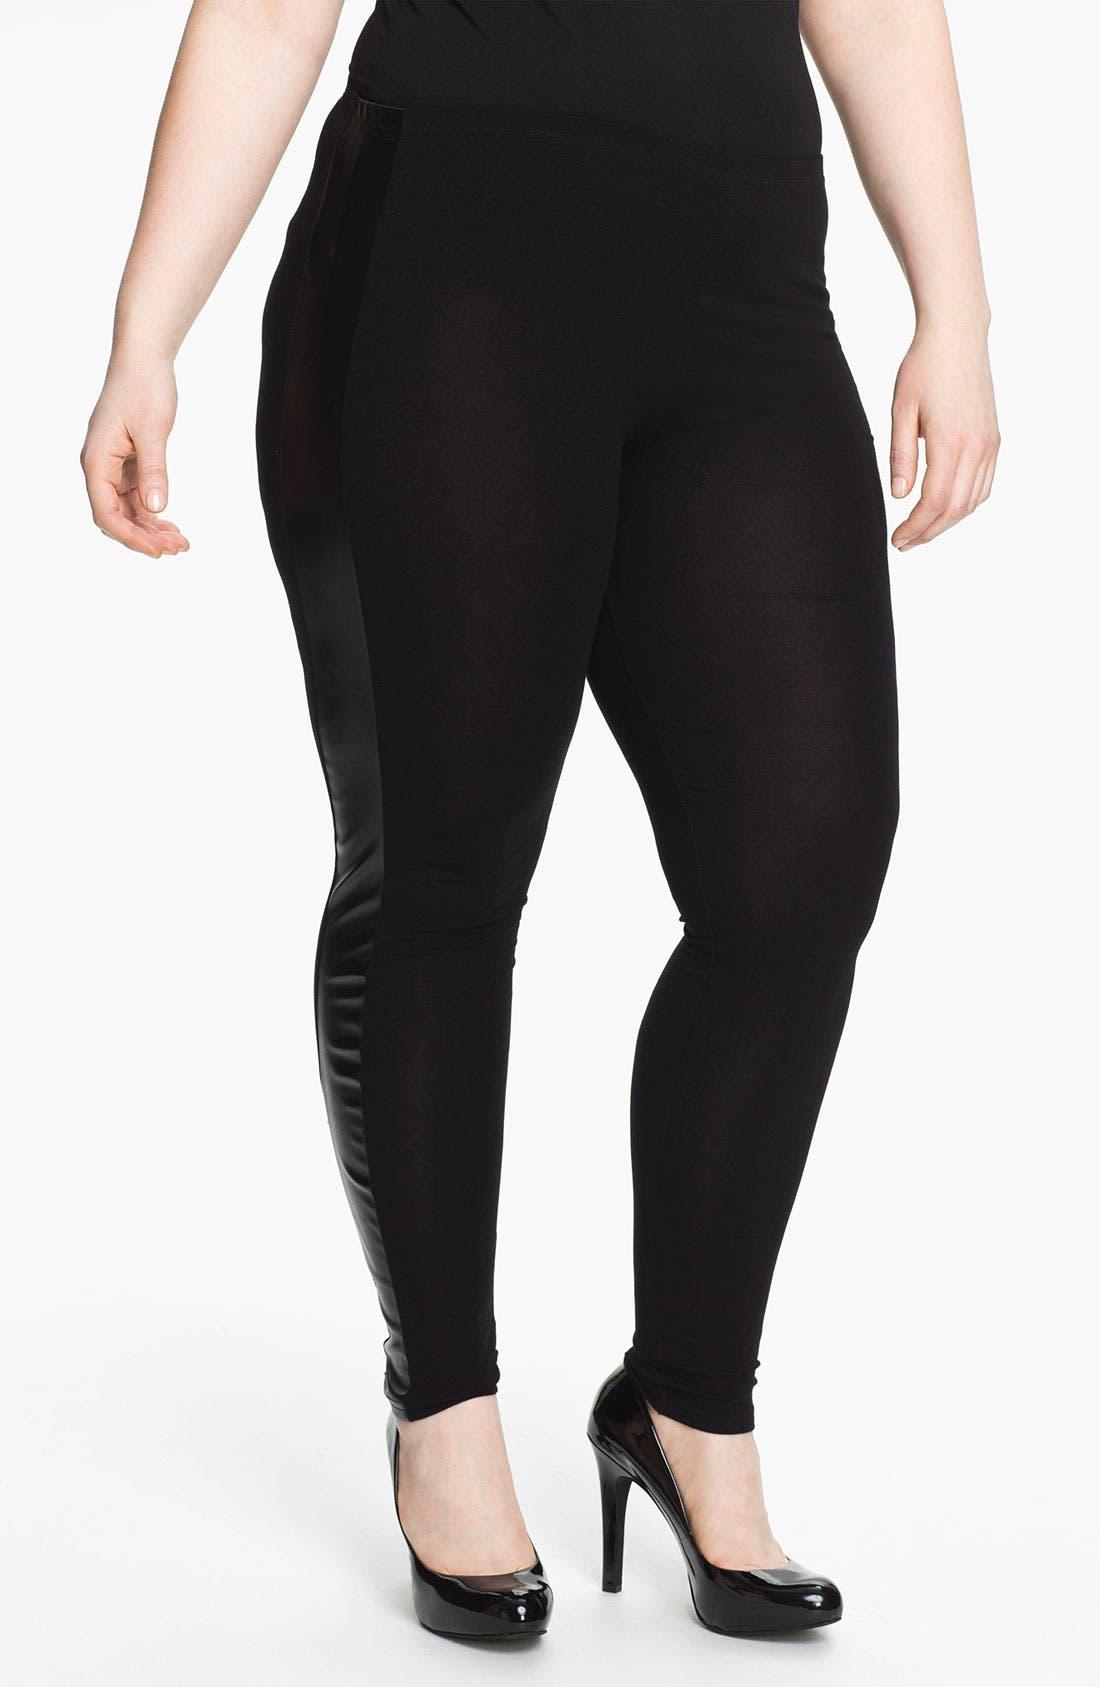 Alternate Image 1 Selected - Evans Faux Leather Trim Leggings (Plus Size)